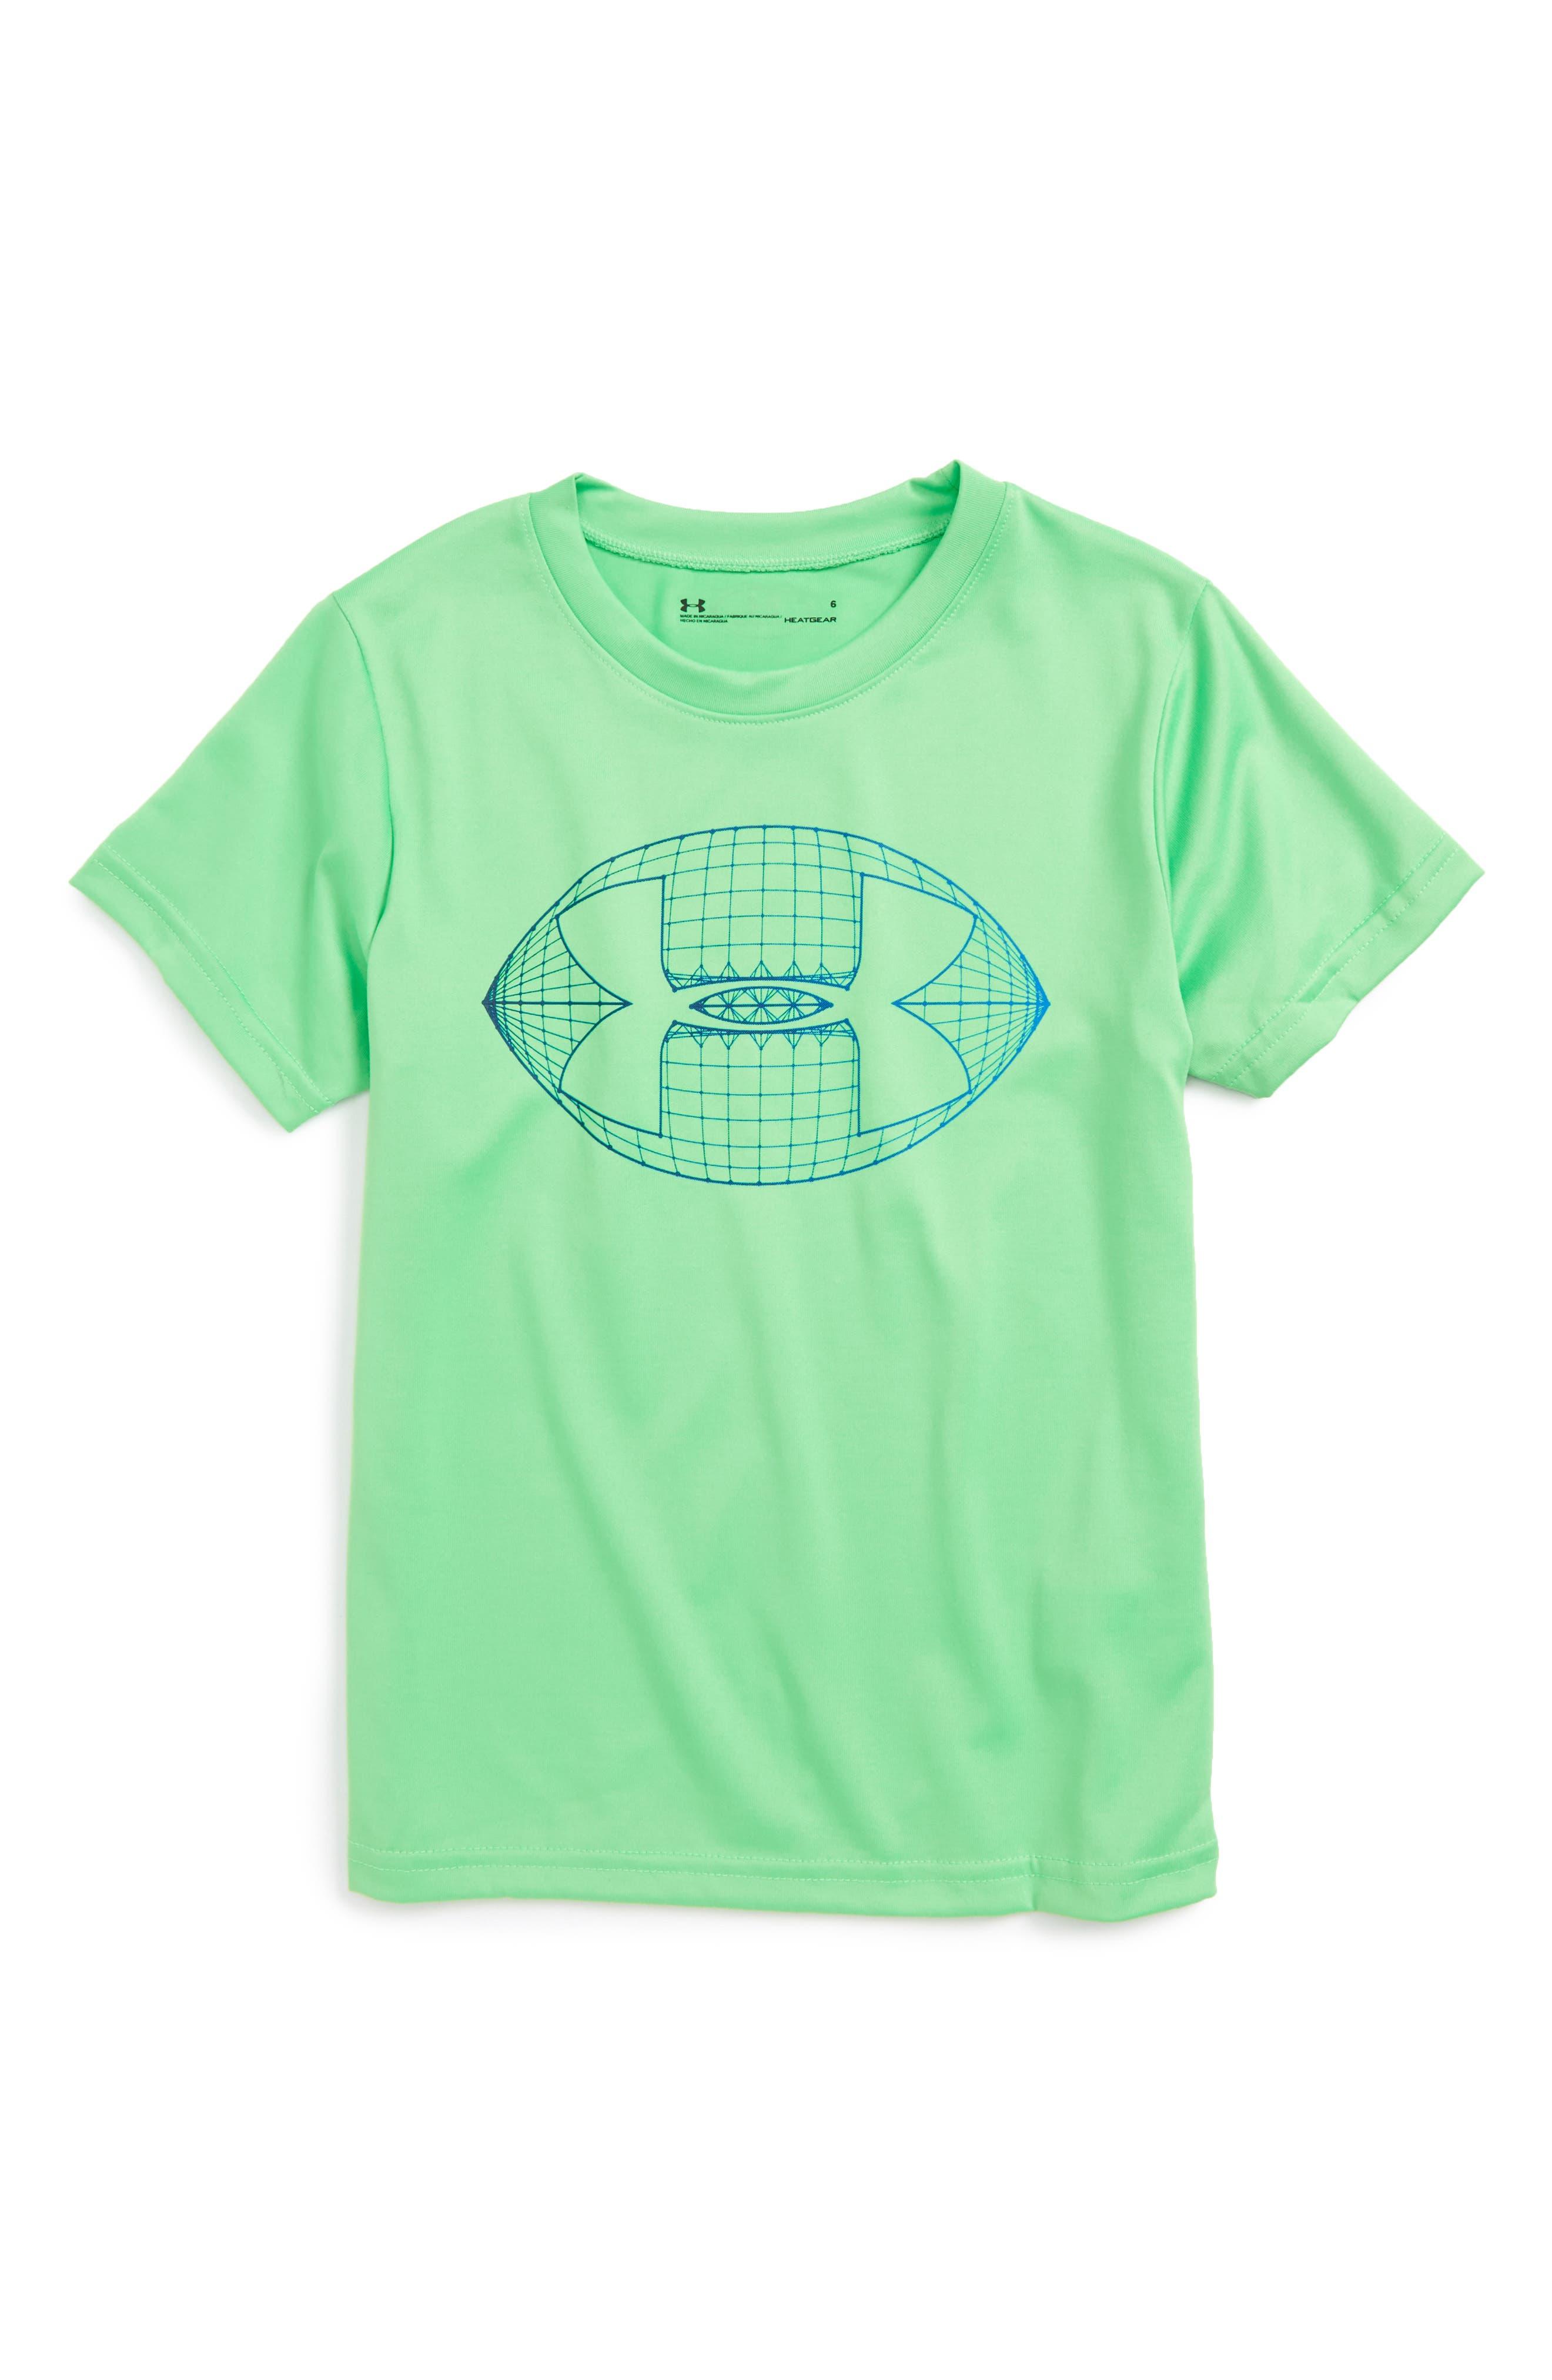 UNDER ARMOUR Football Logo Graphic T-Shirt